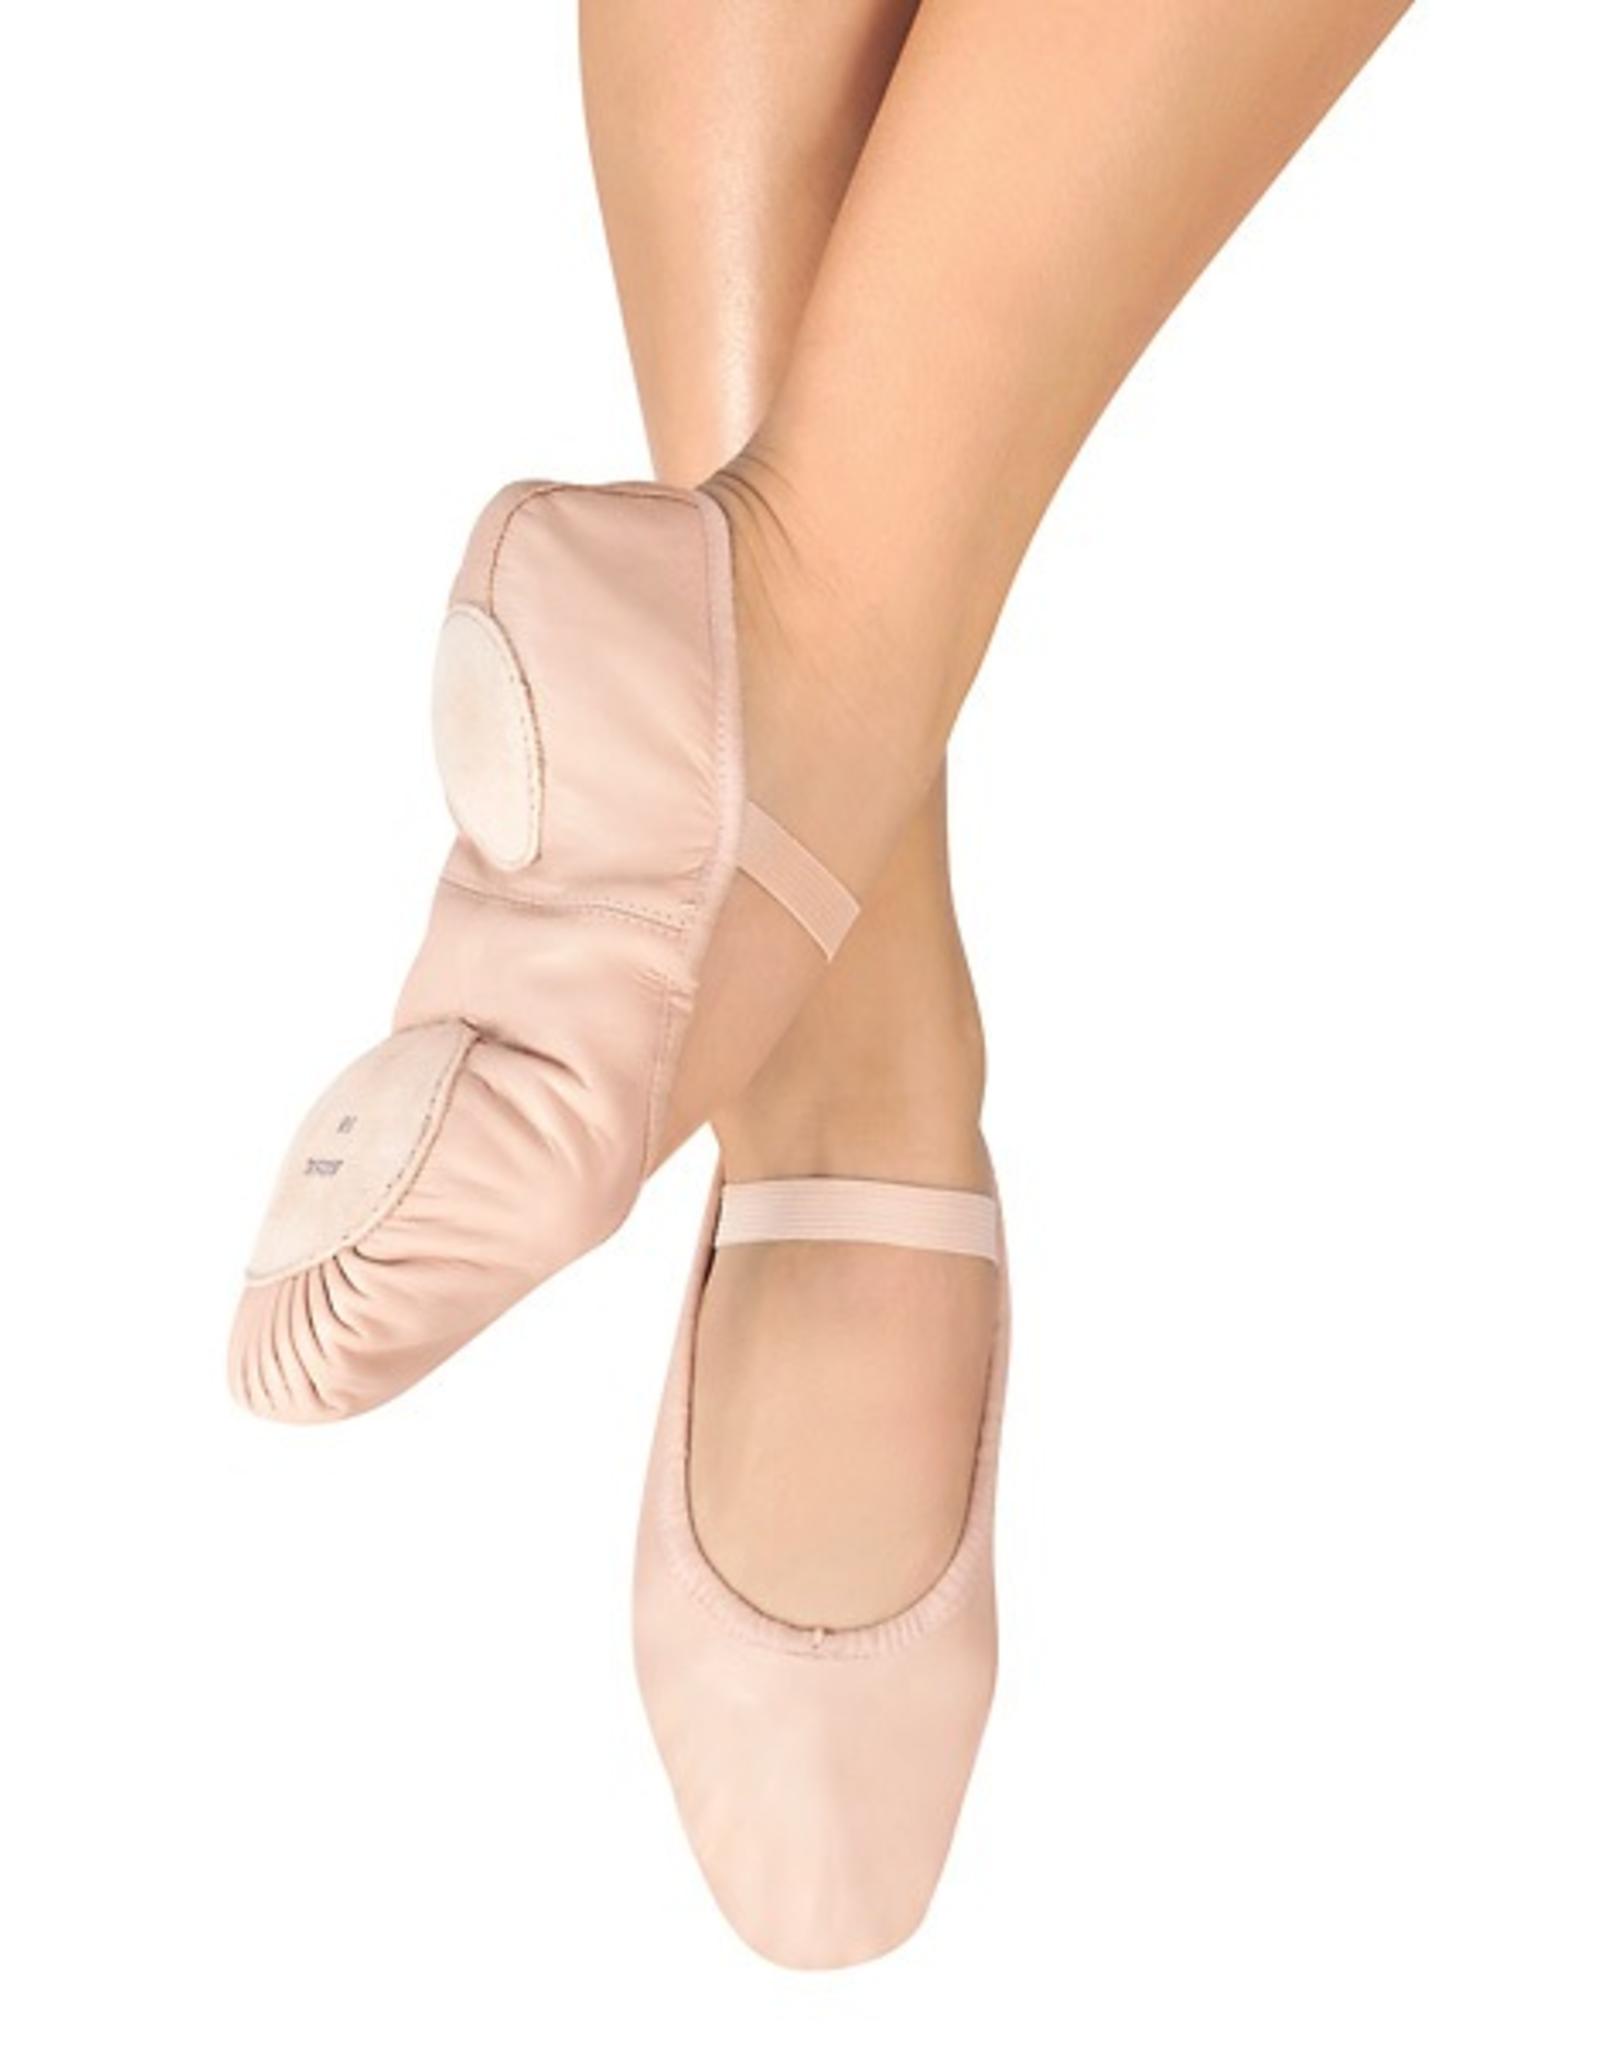 Bloch S0258L Split Sole Pink Leather Ballet Slipper Adult